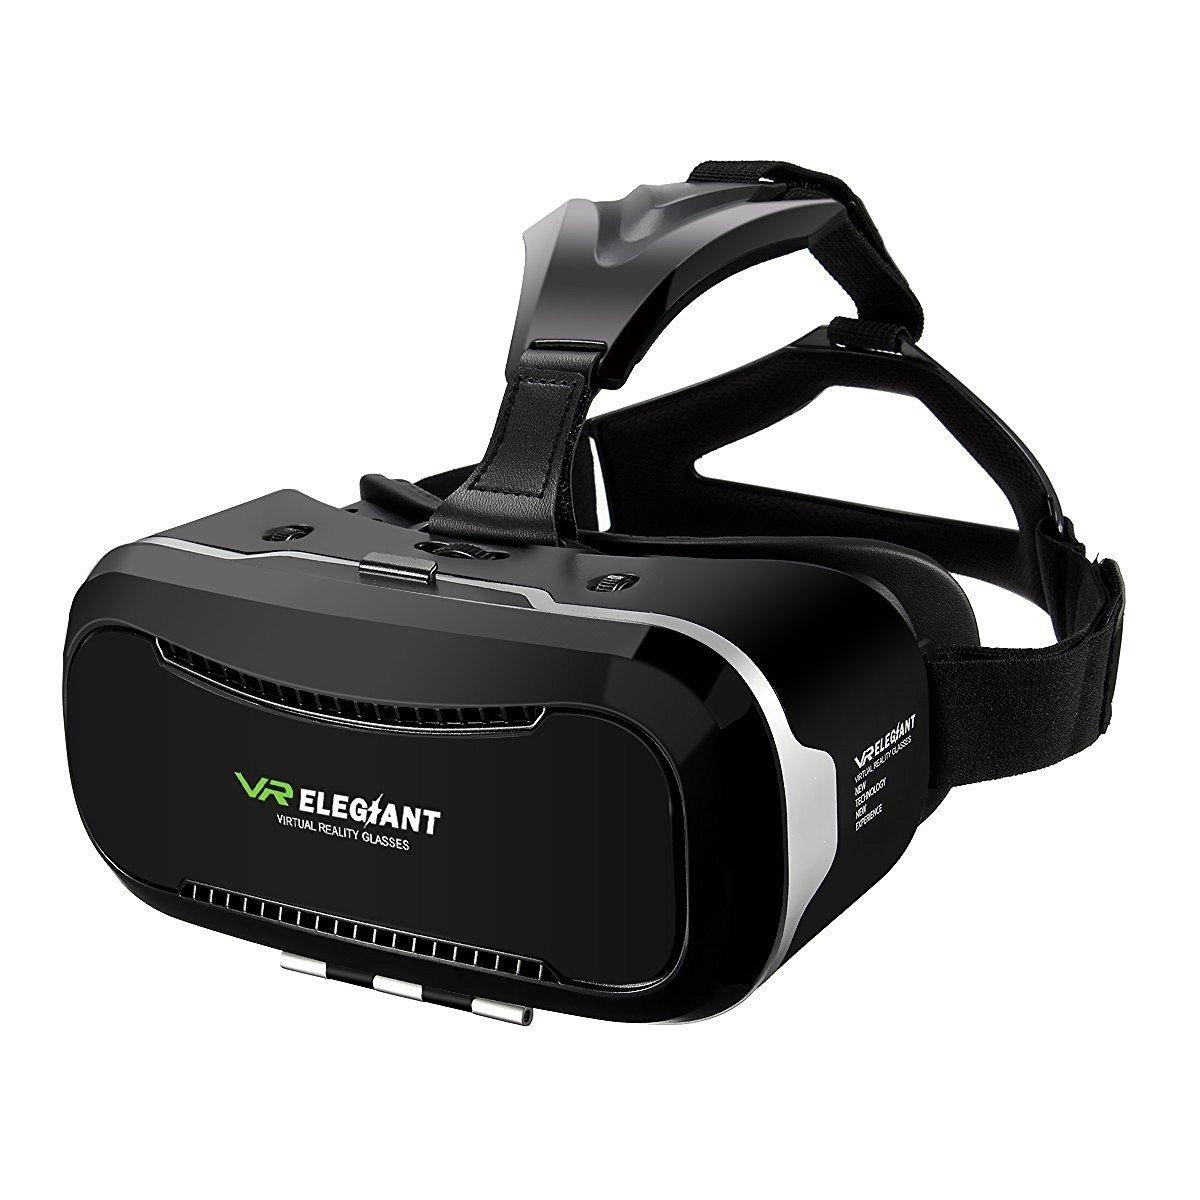 ELEGIANT 3D VR Headset, Universal 3D VR Brille Einstellbar Brille Video Movie Game Brille Virtual 3D Reality Glasses